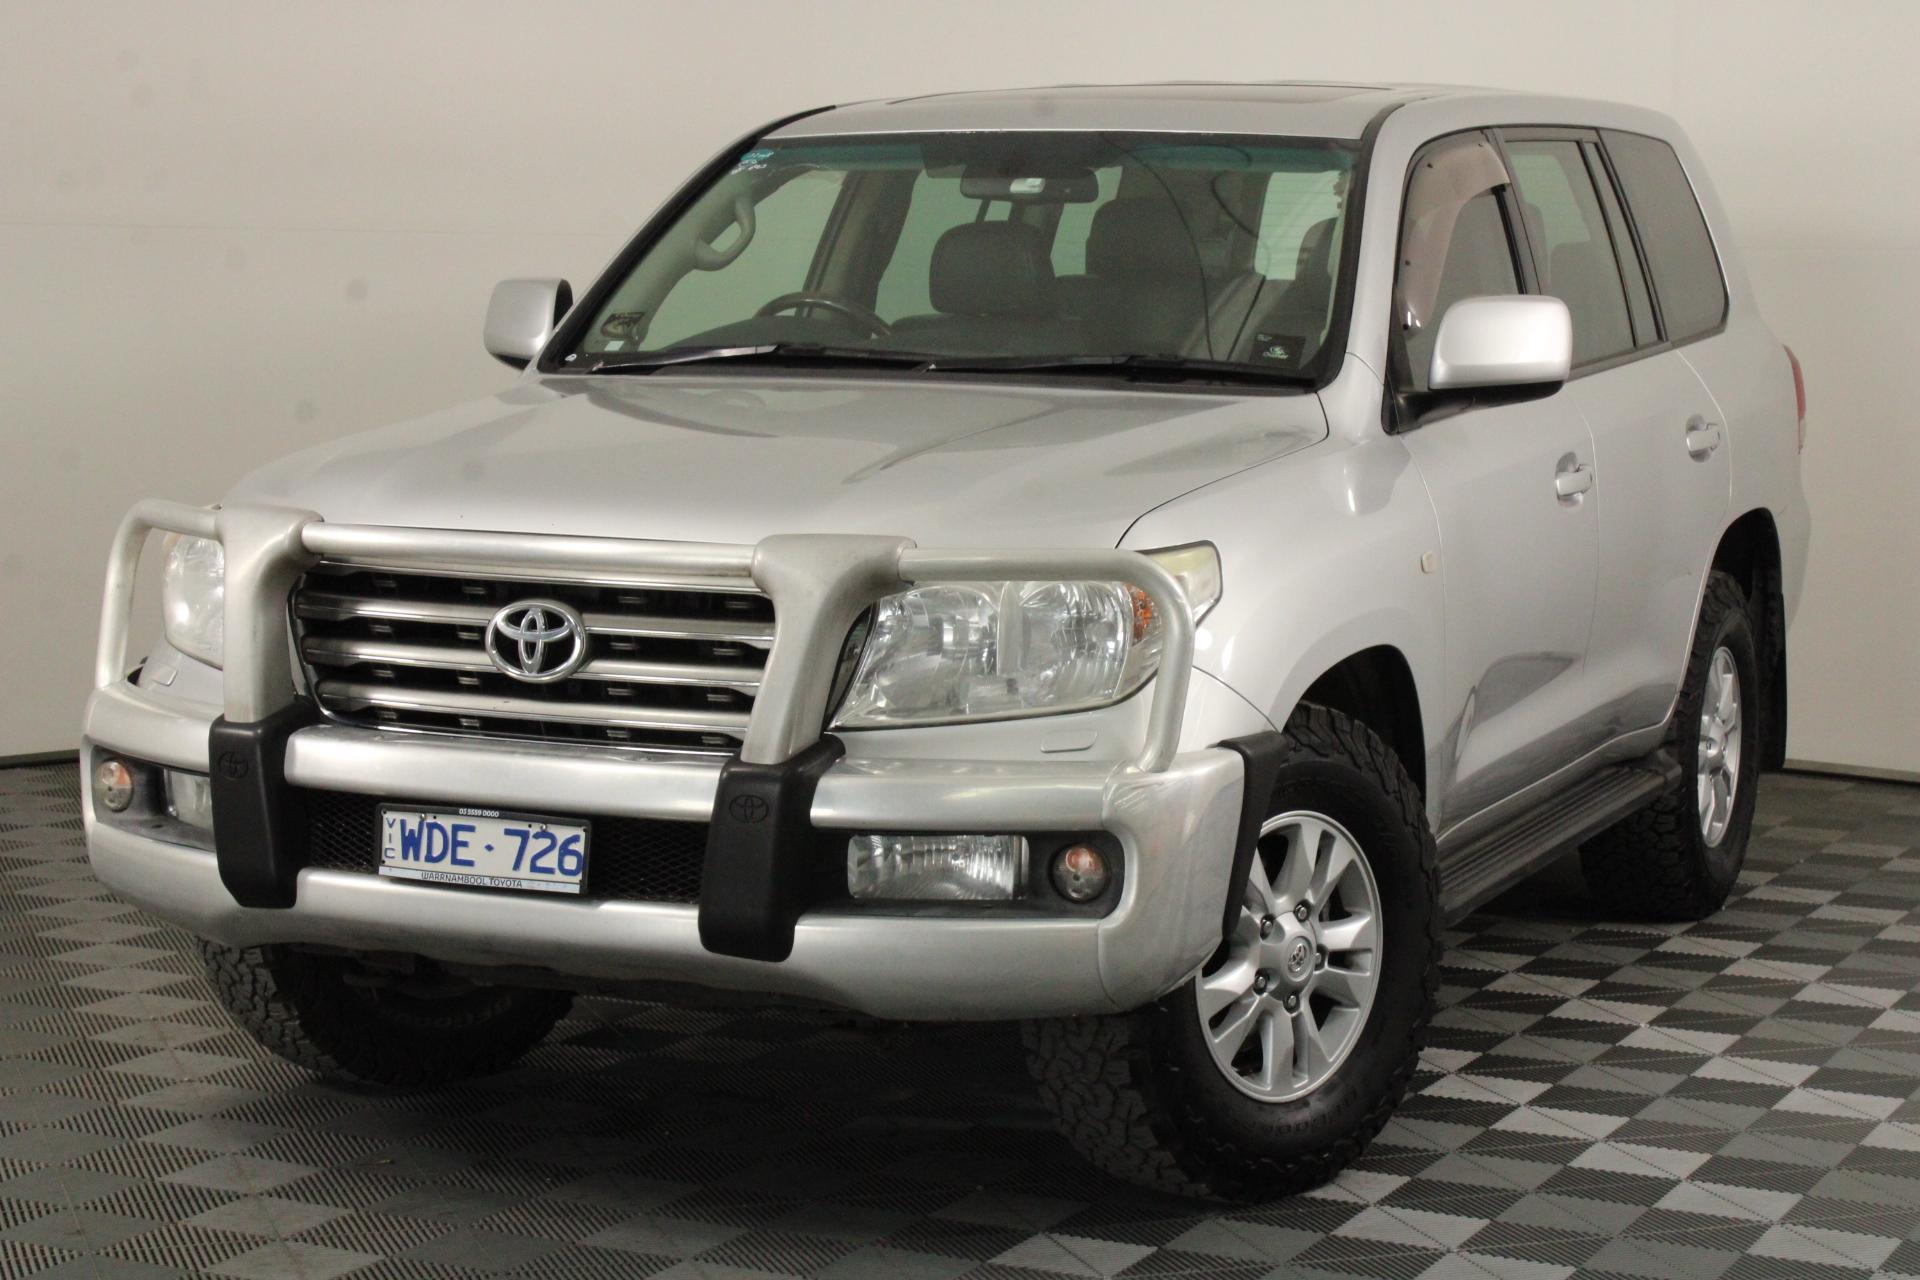 2007 Toyota Landcruiser Sahara (4x4) VDJ200R T/Diesel Auto 8 Seats